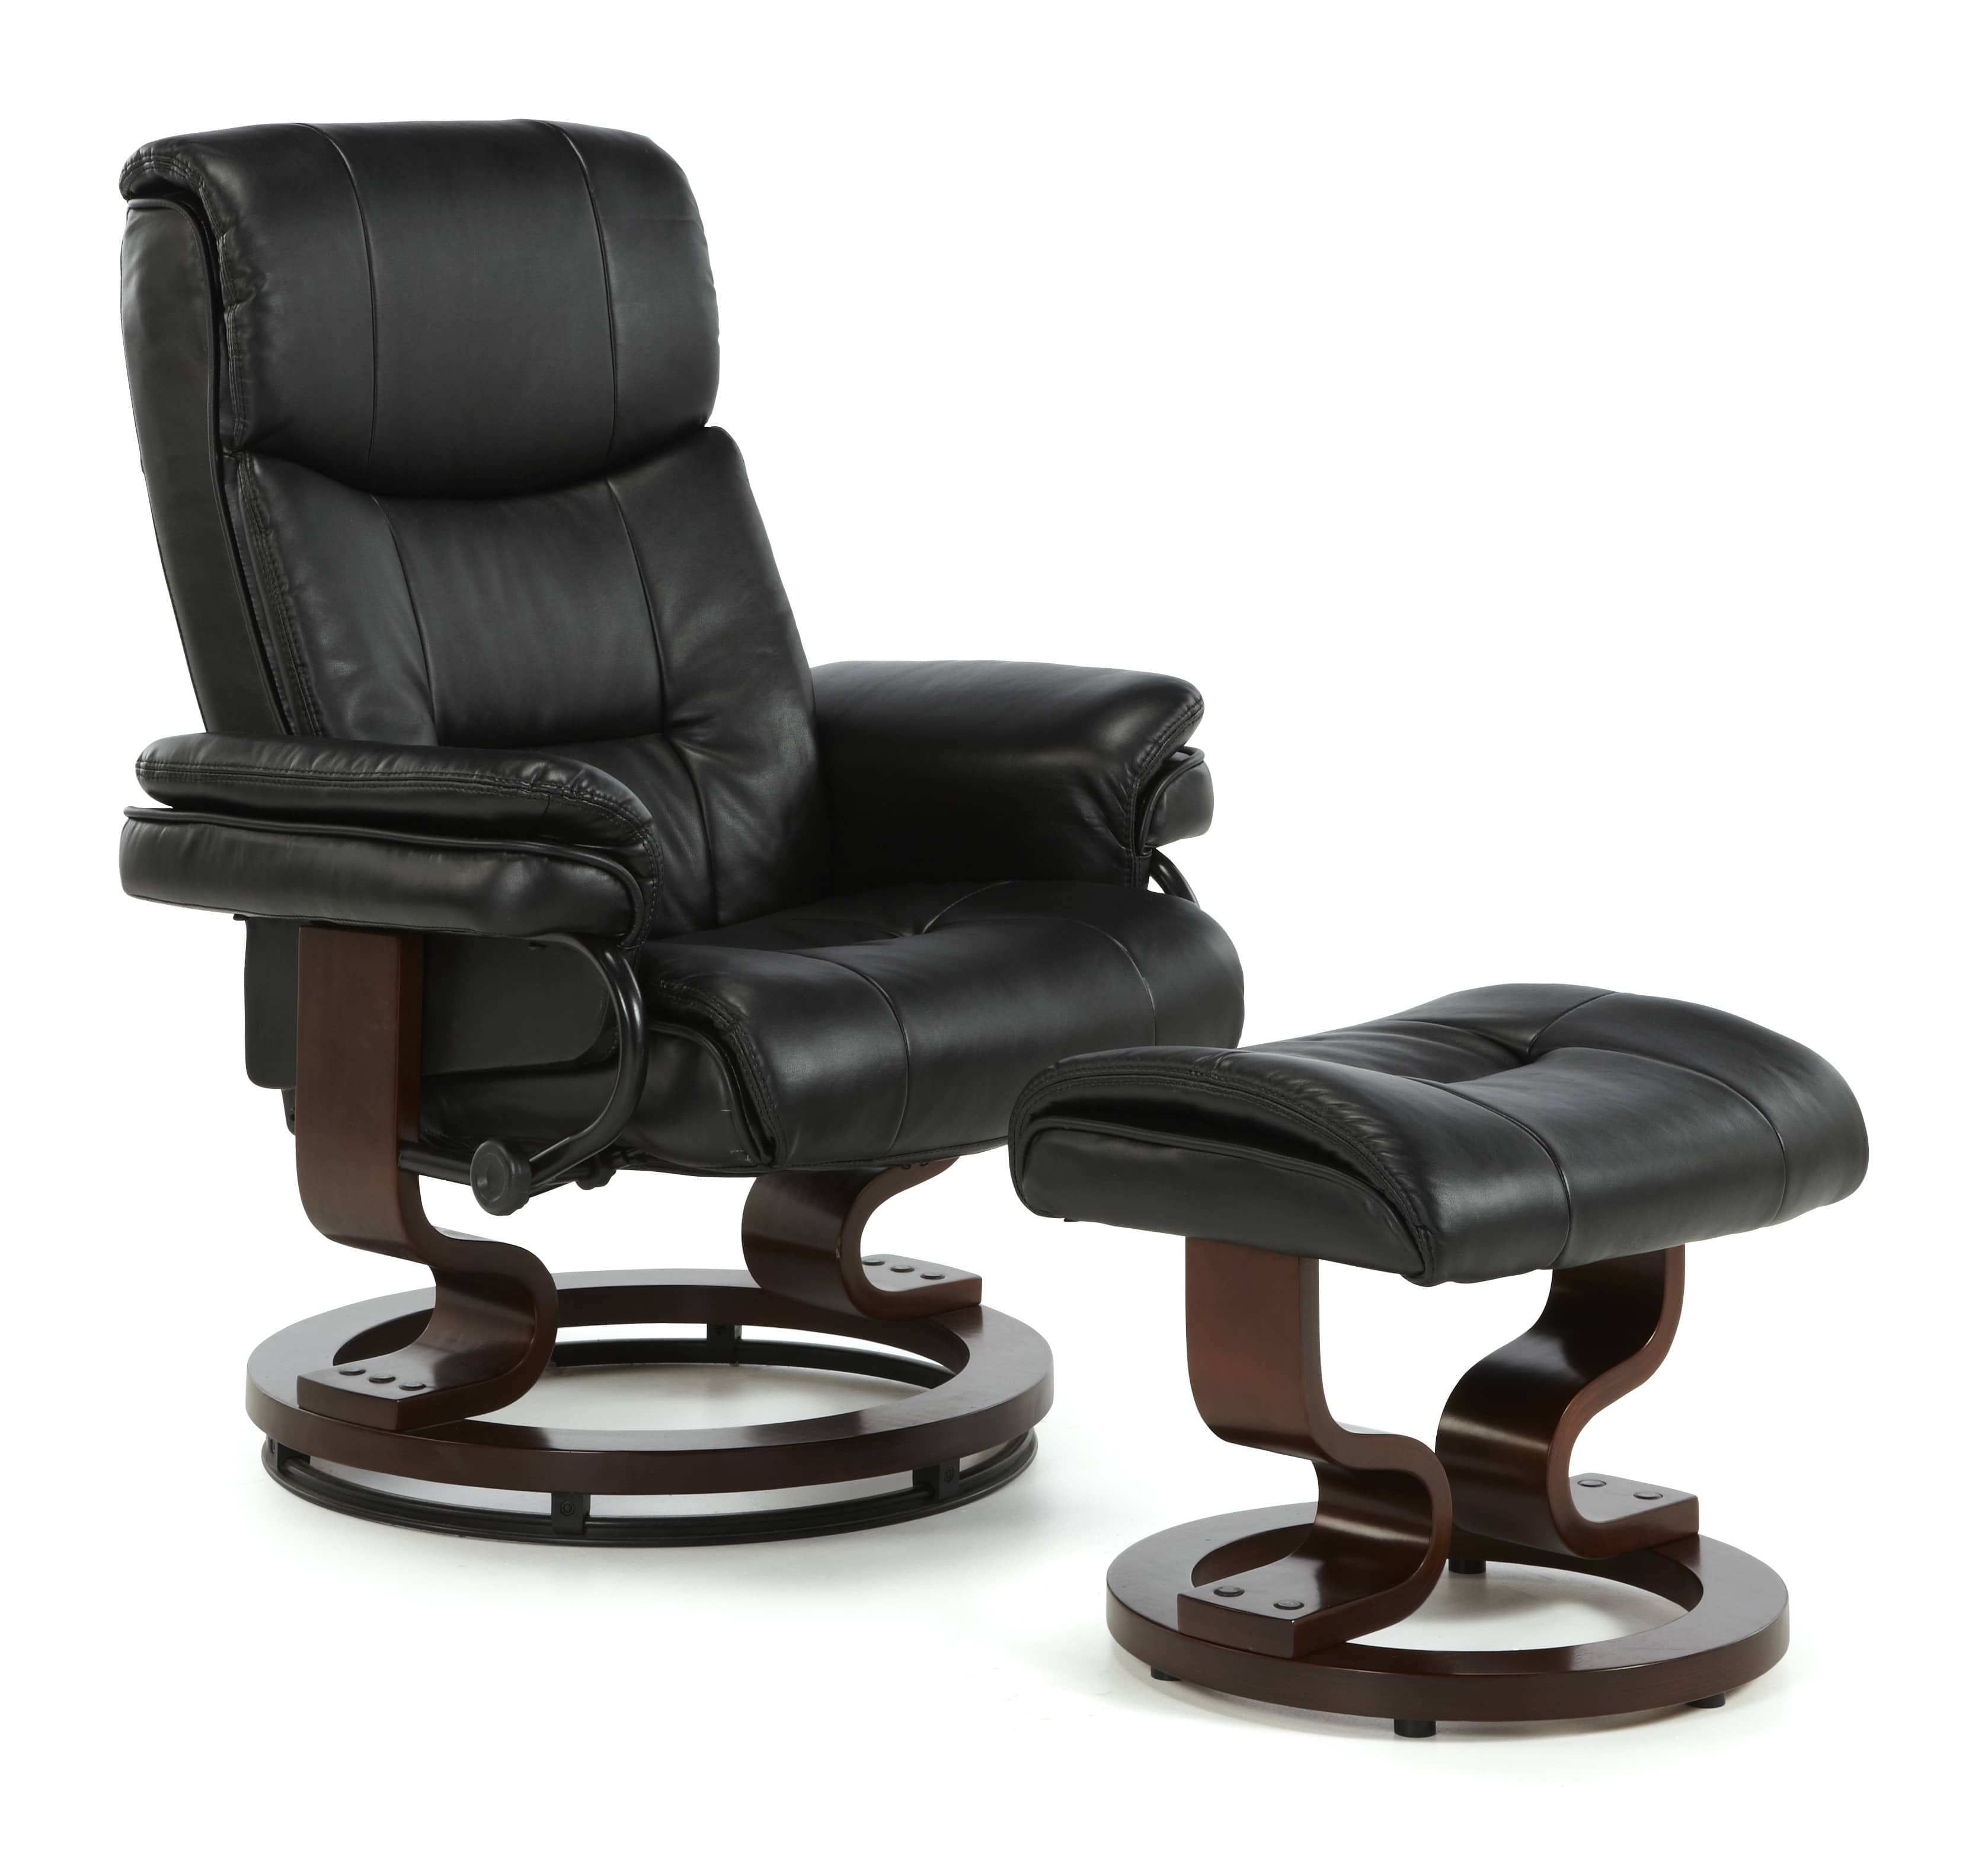 Moss Swivel Chair Black PU Mahogany A min